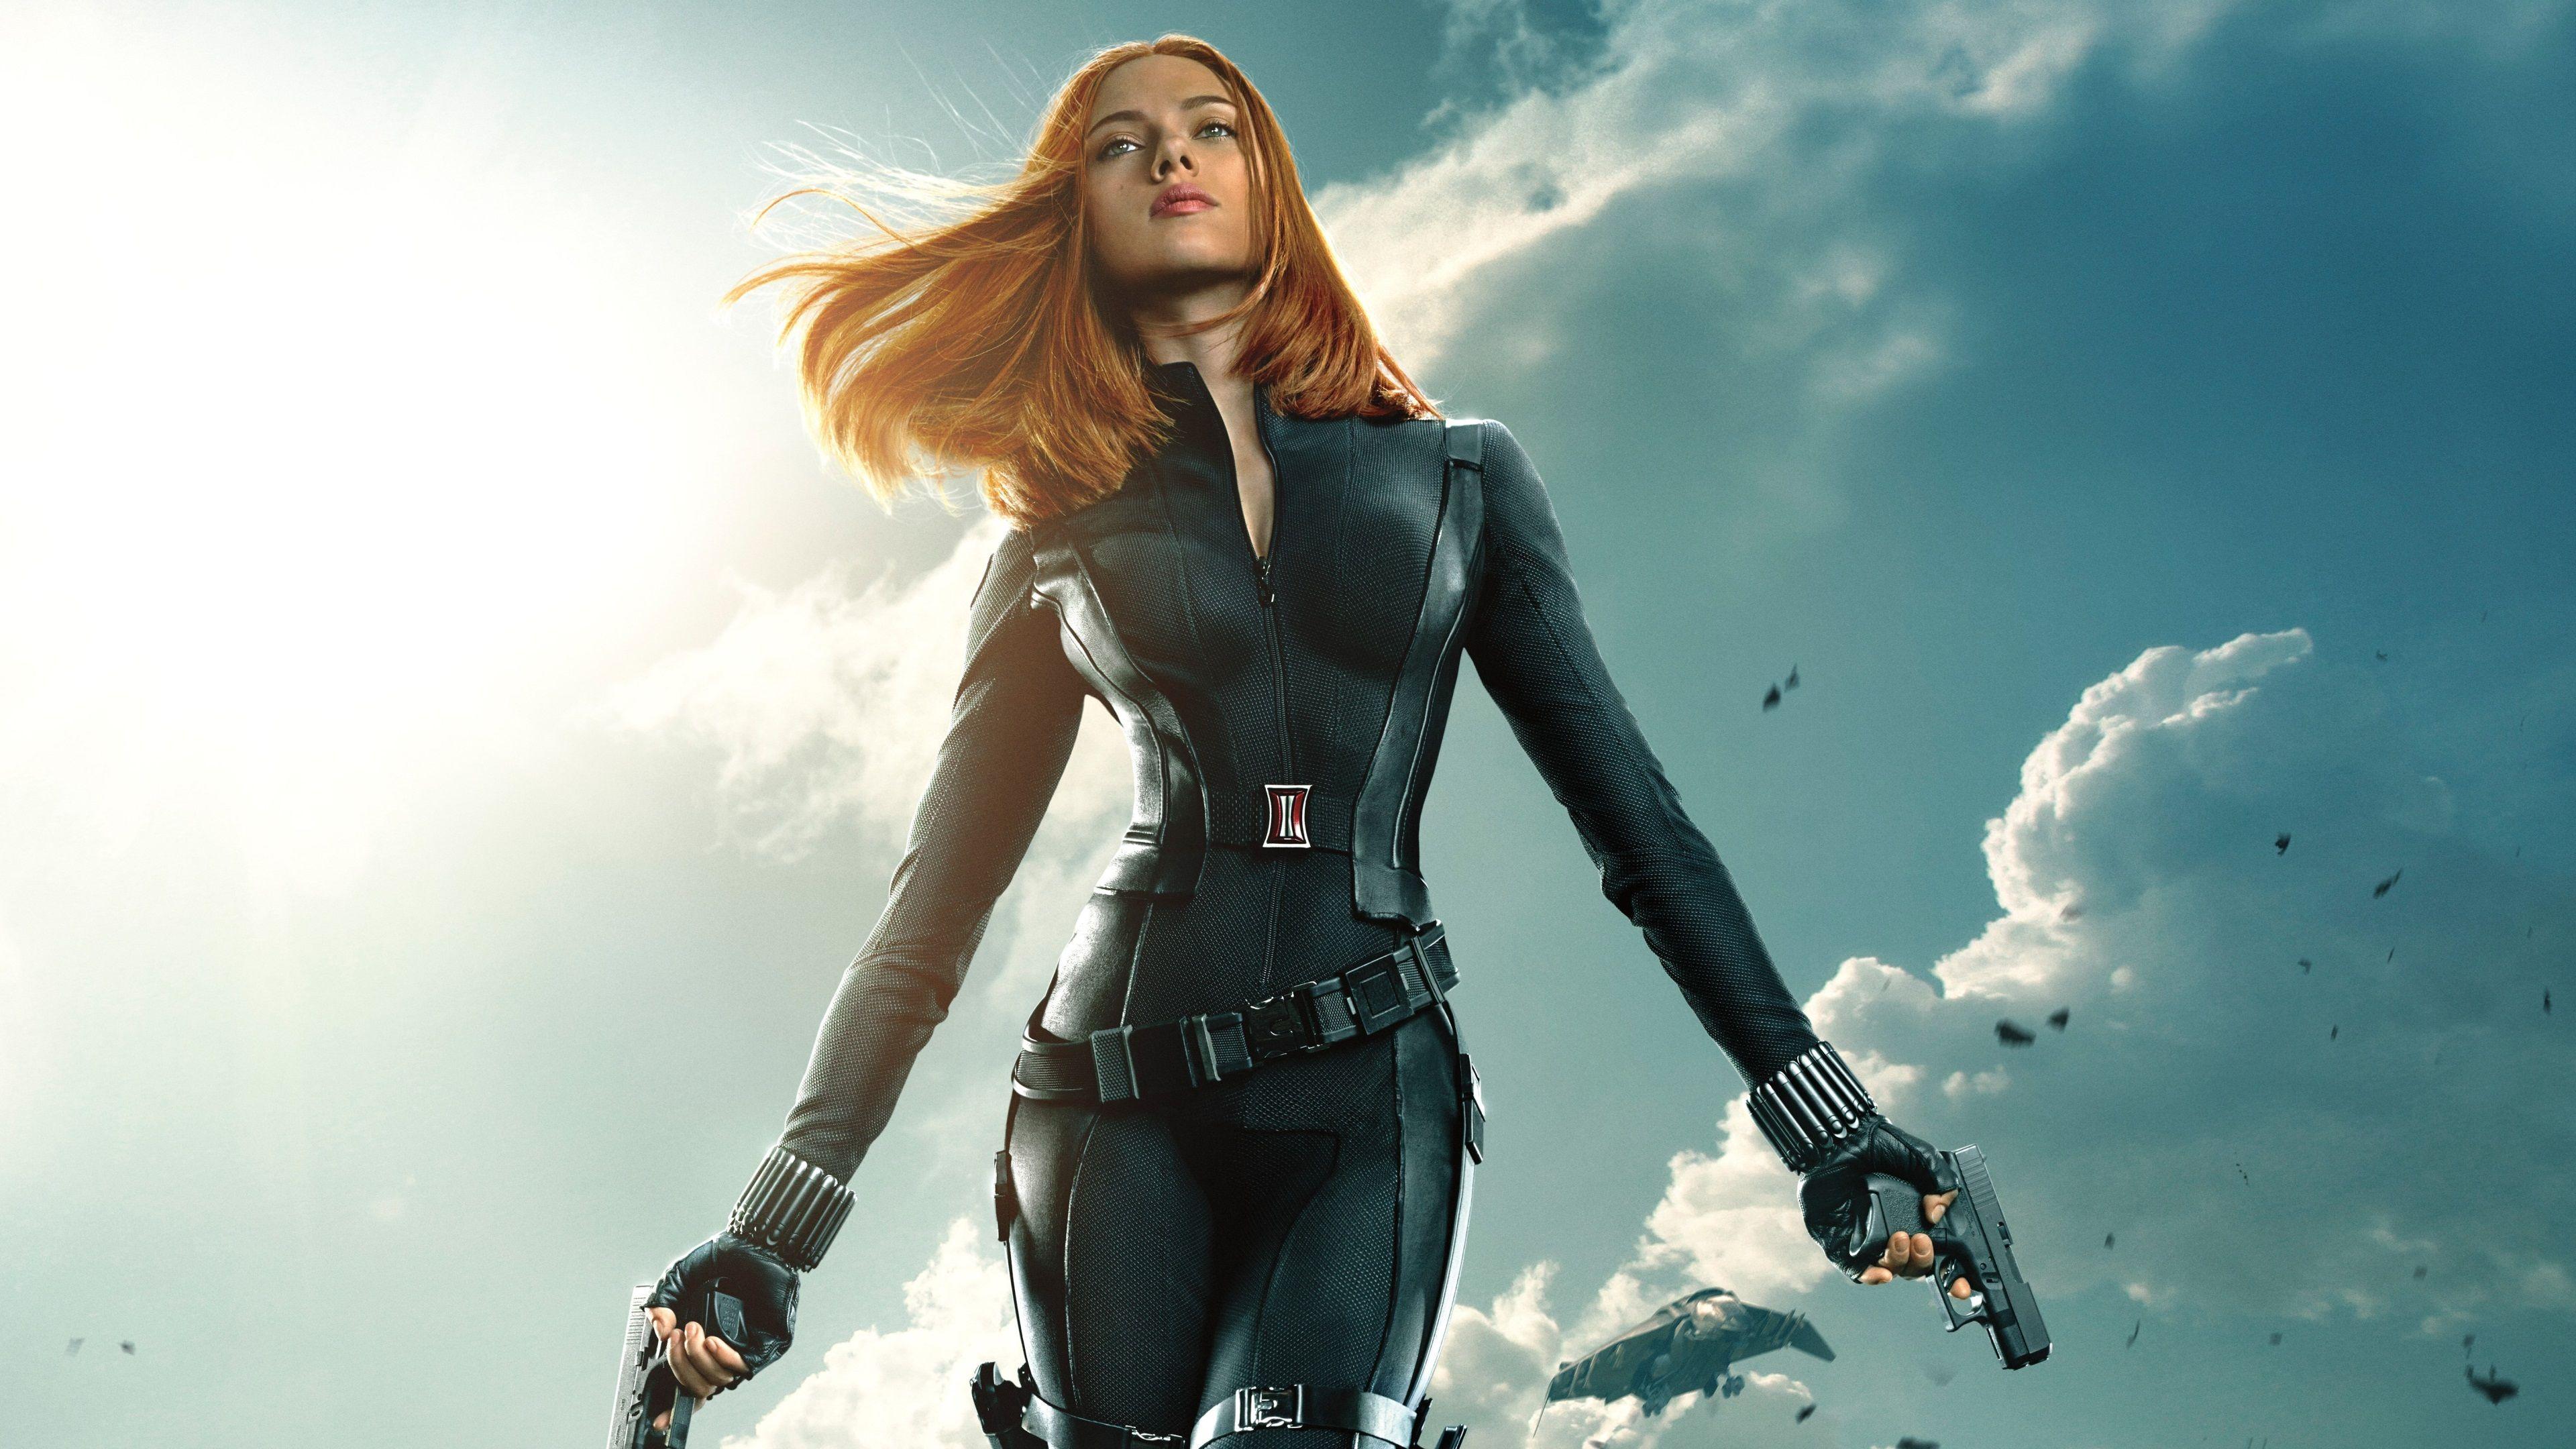 3840x2160 Black Widow 4k Amazing Wallpaper Free Download